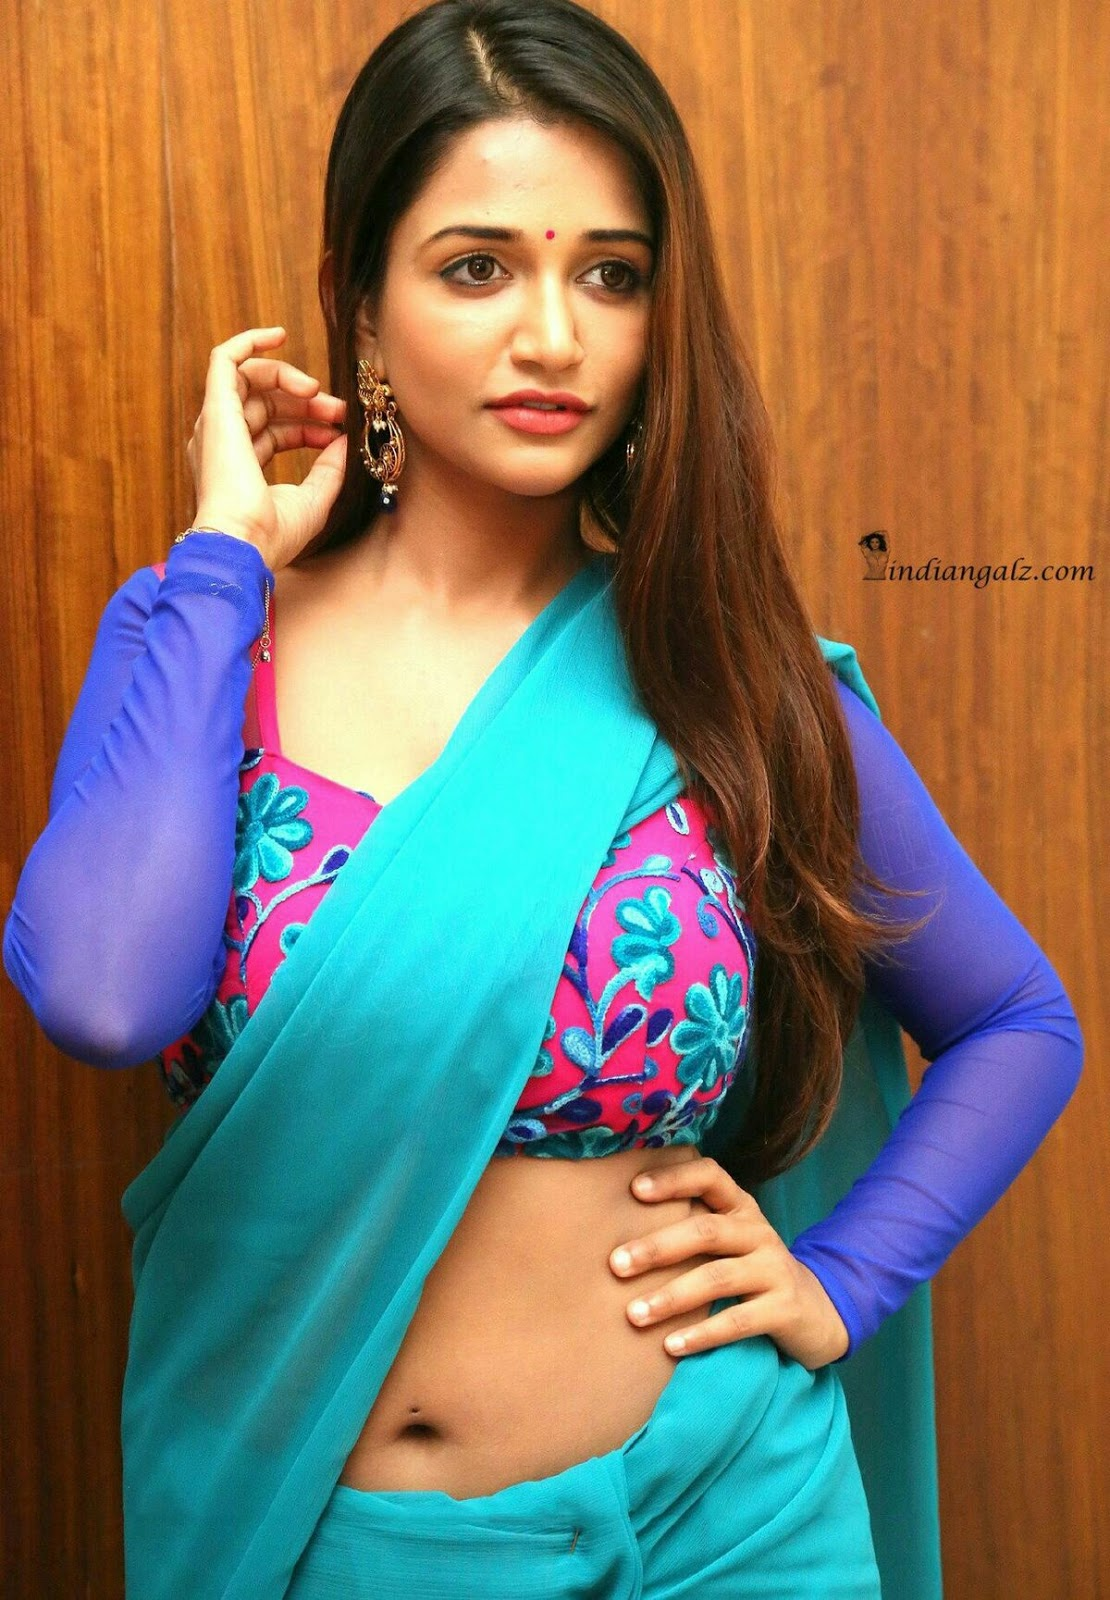 Bollywood actress sex photo hd